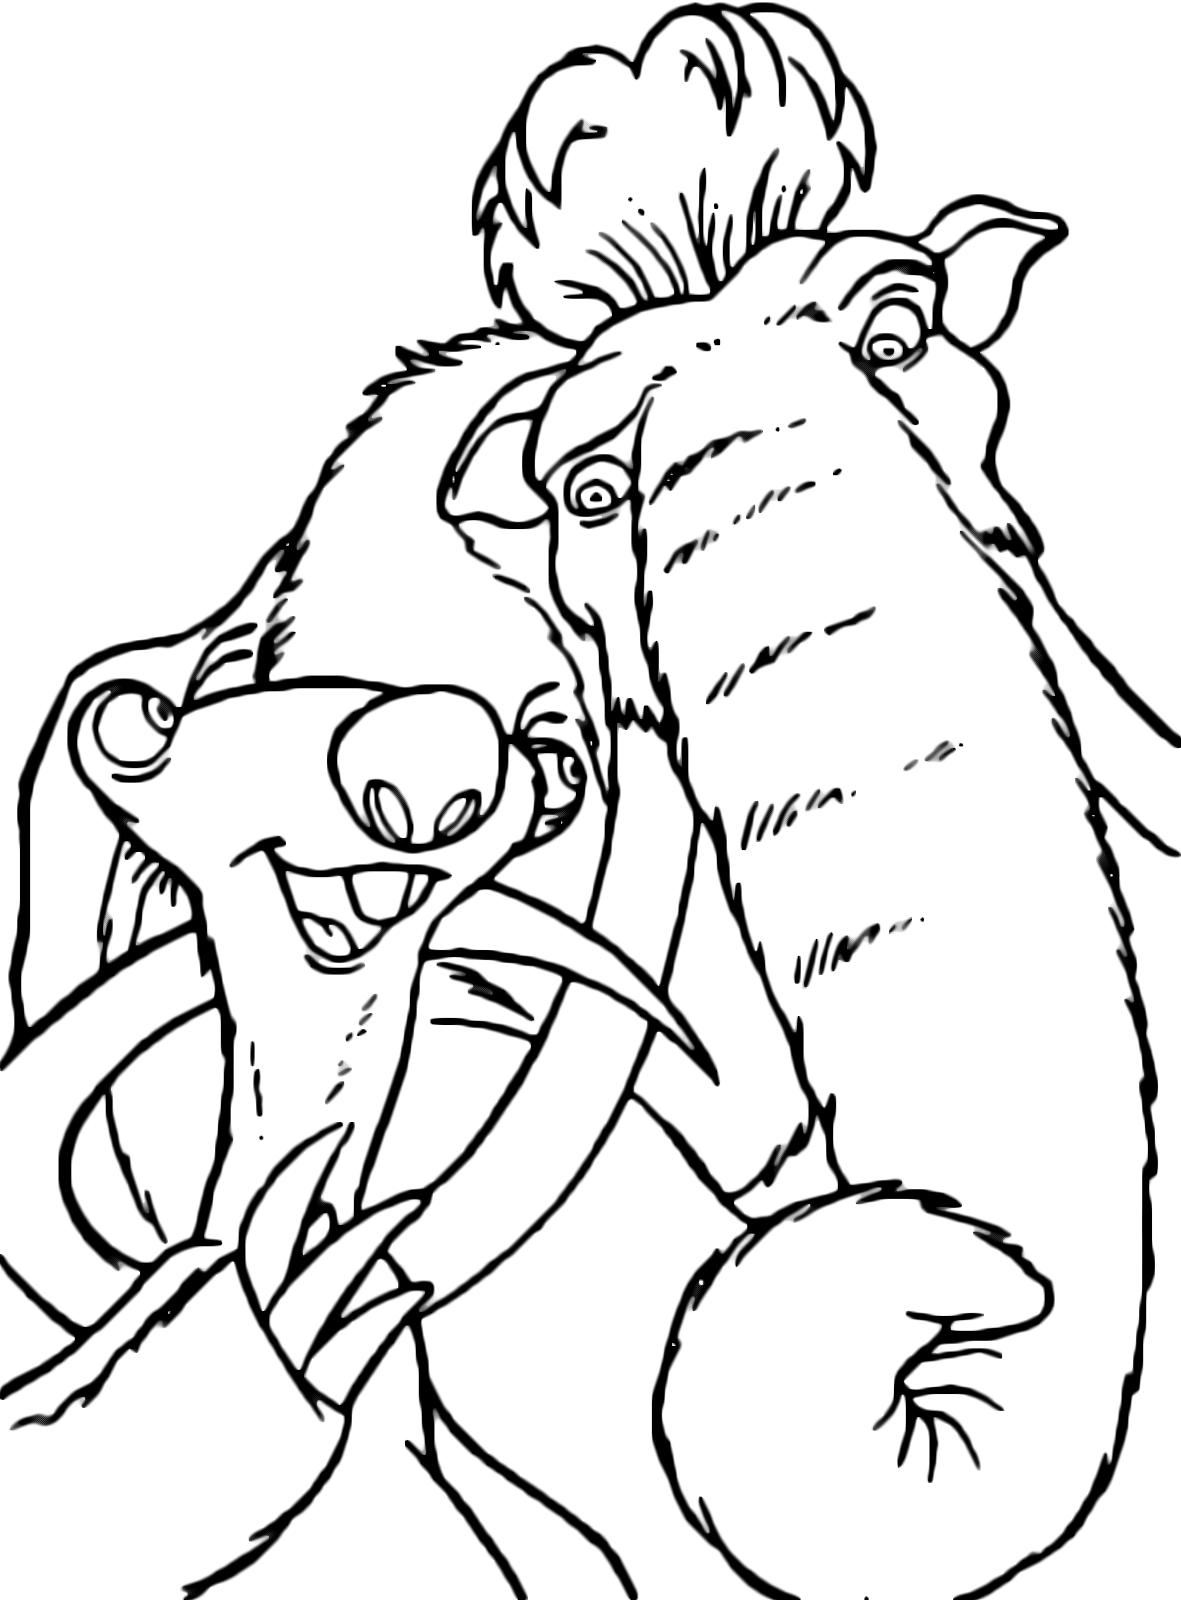 Ice Age Coloring Pages Pdf : L era glaciale sid il bradipo parla con manny mammut